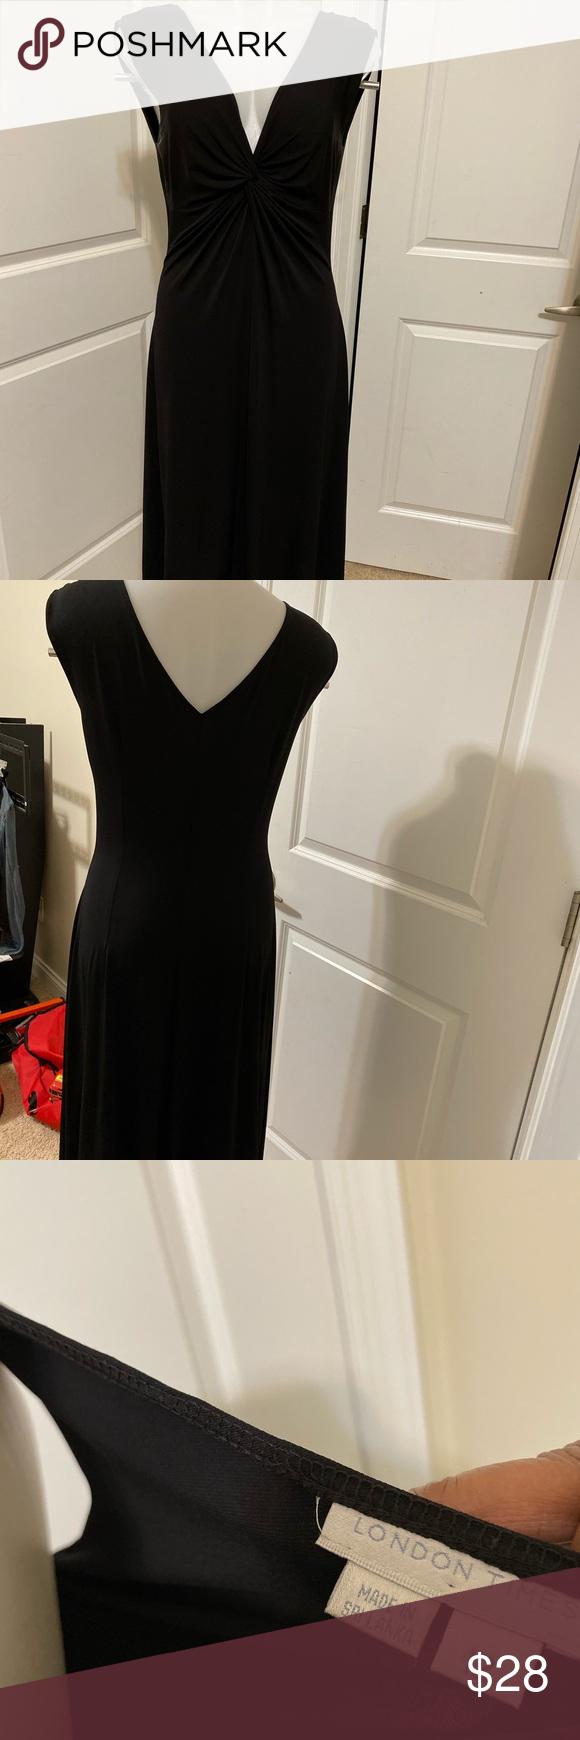 Beautiful Black Dress Size 12 Beautiful Black Dresses Black Dress Dresses [ 1740 x 580 Pixel ]